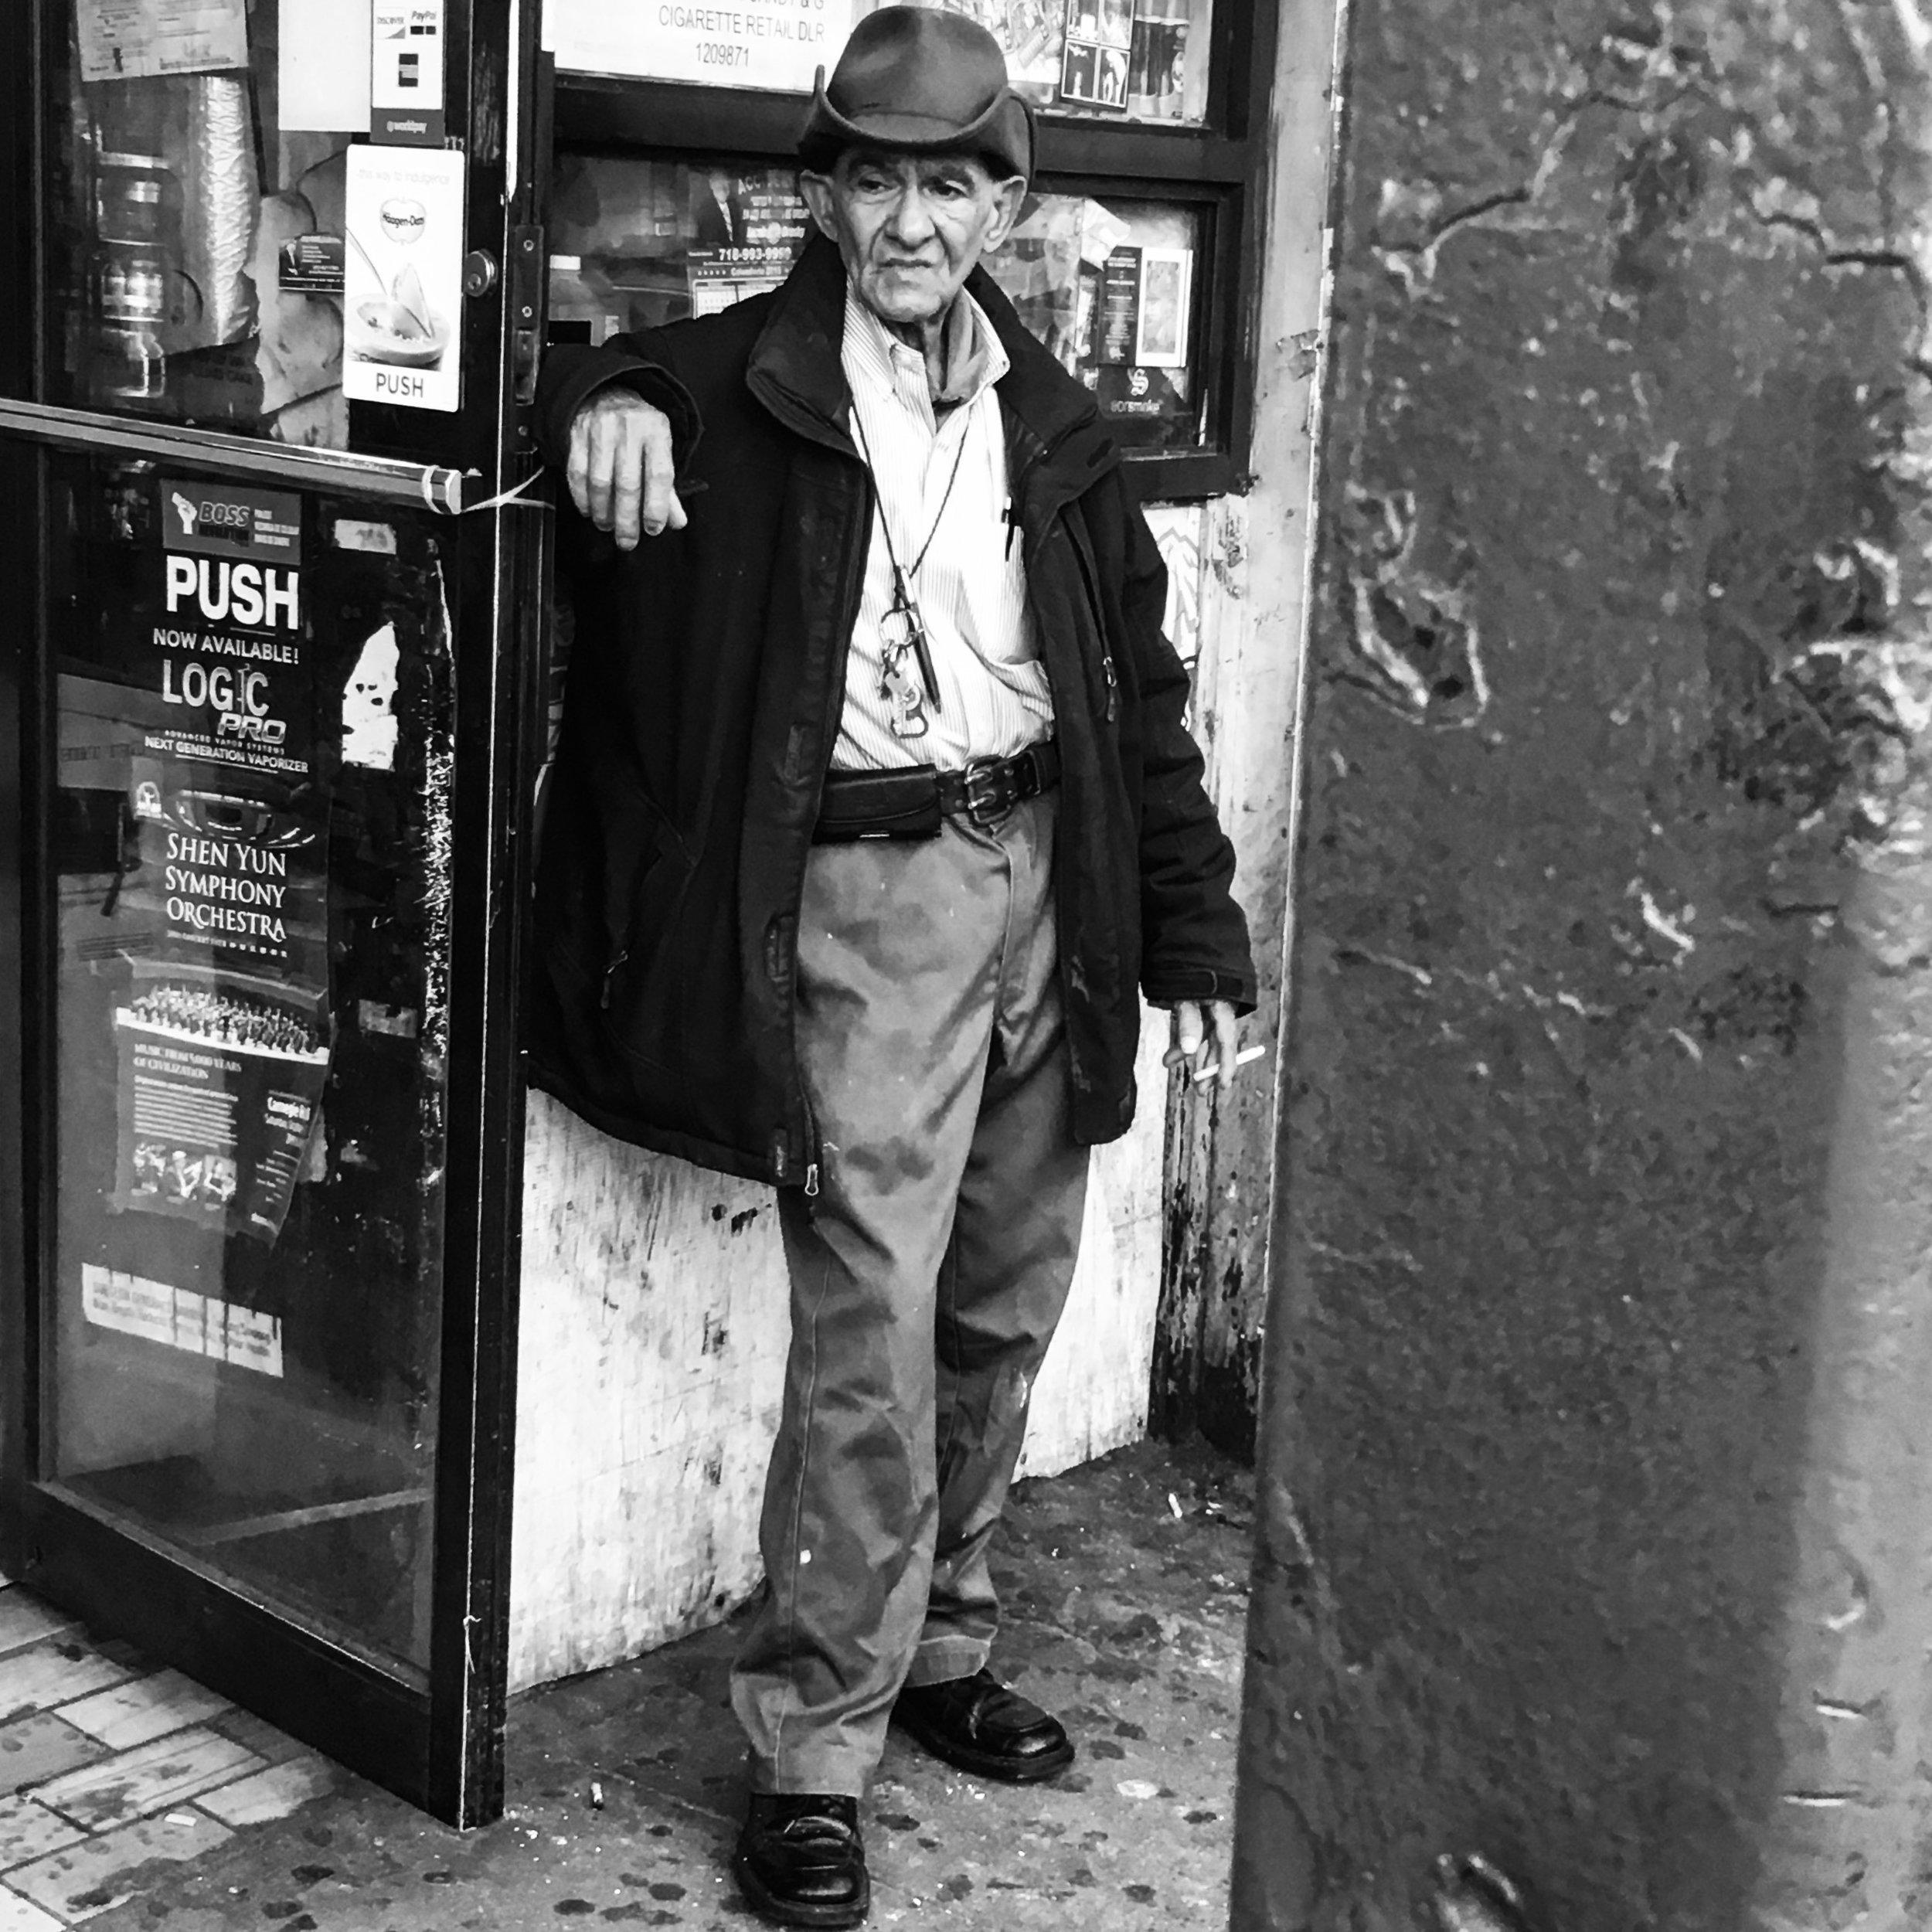 Hombre Pensativo - Washington Heights 2017